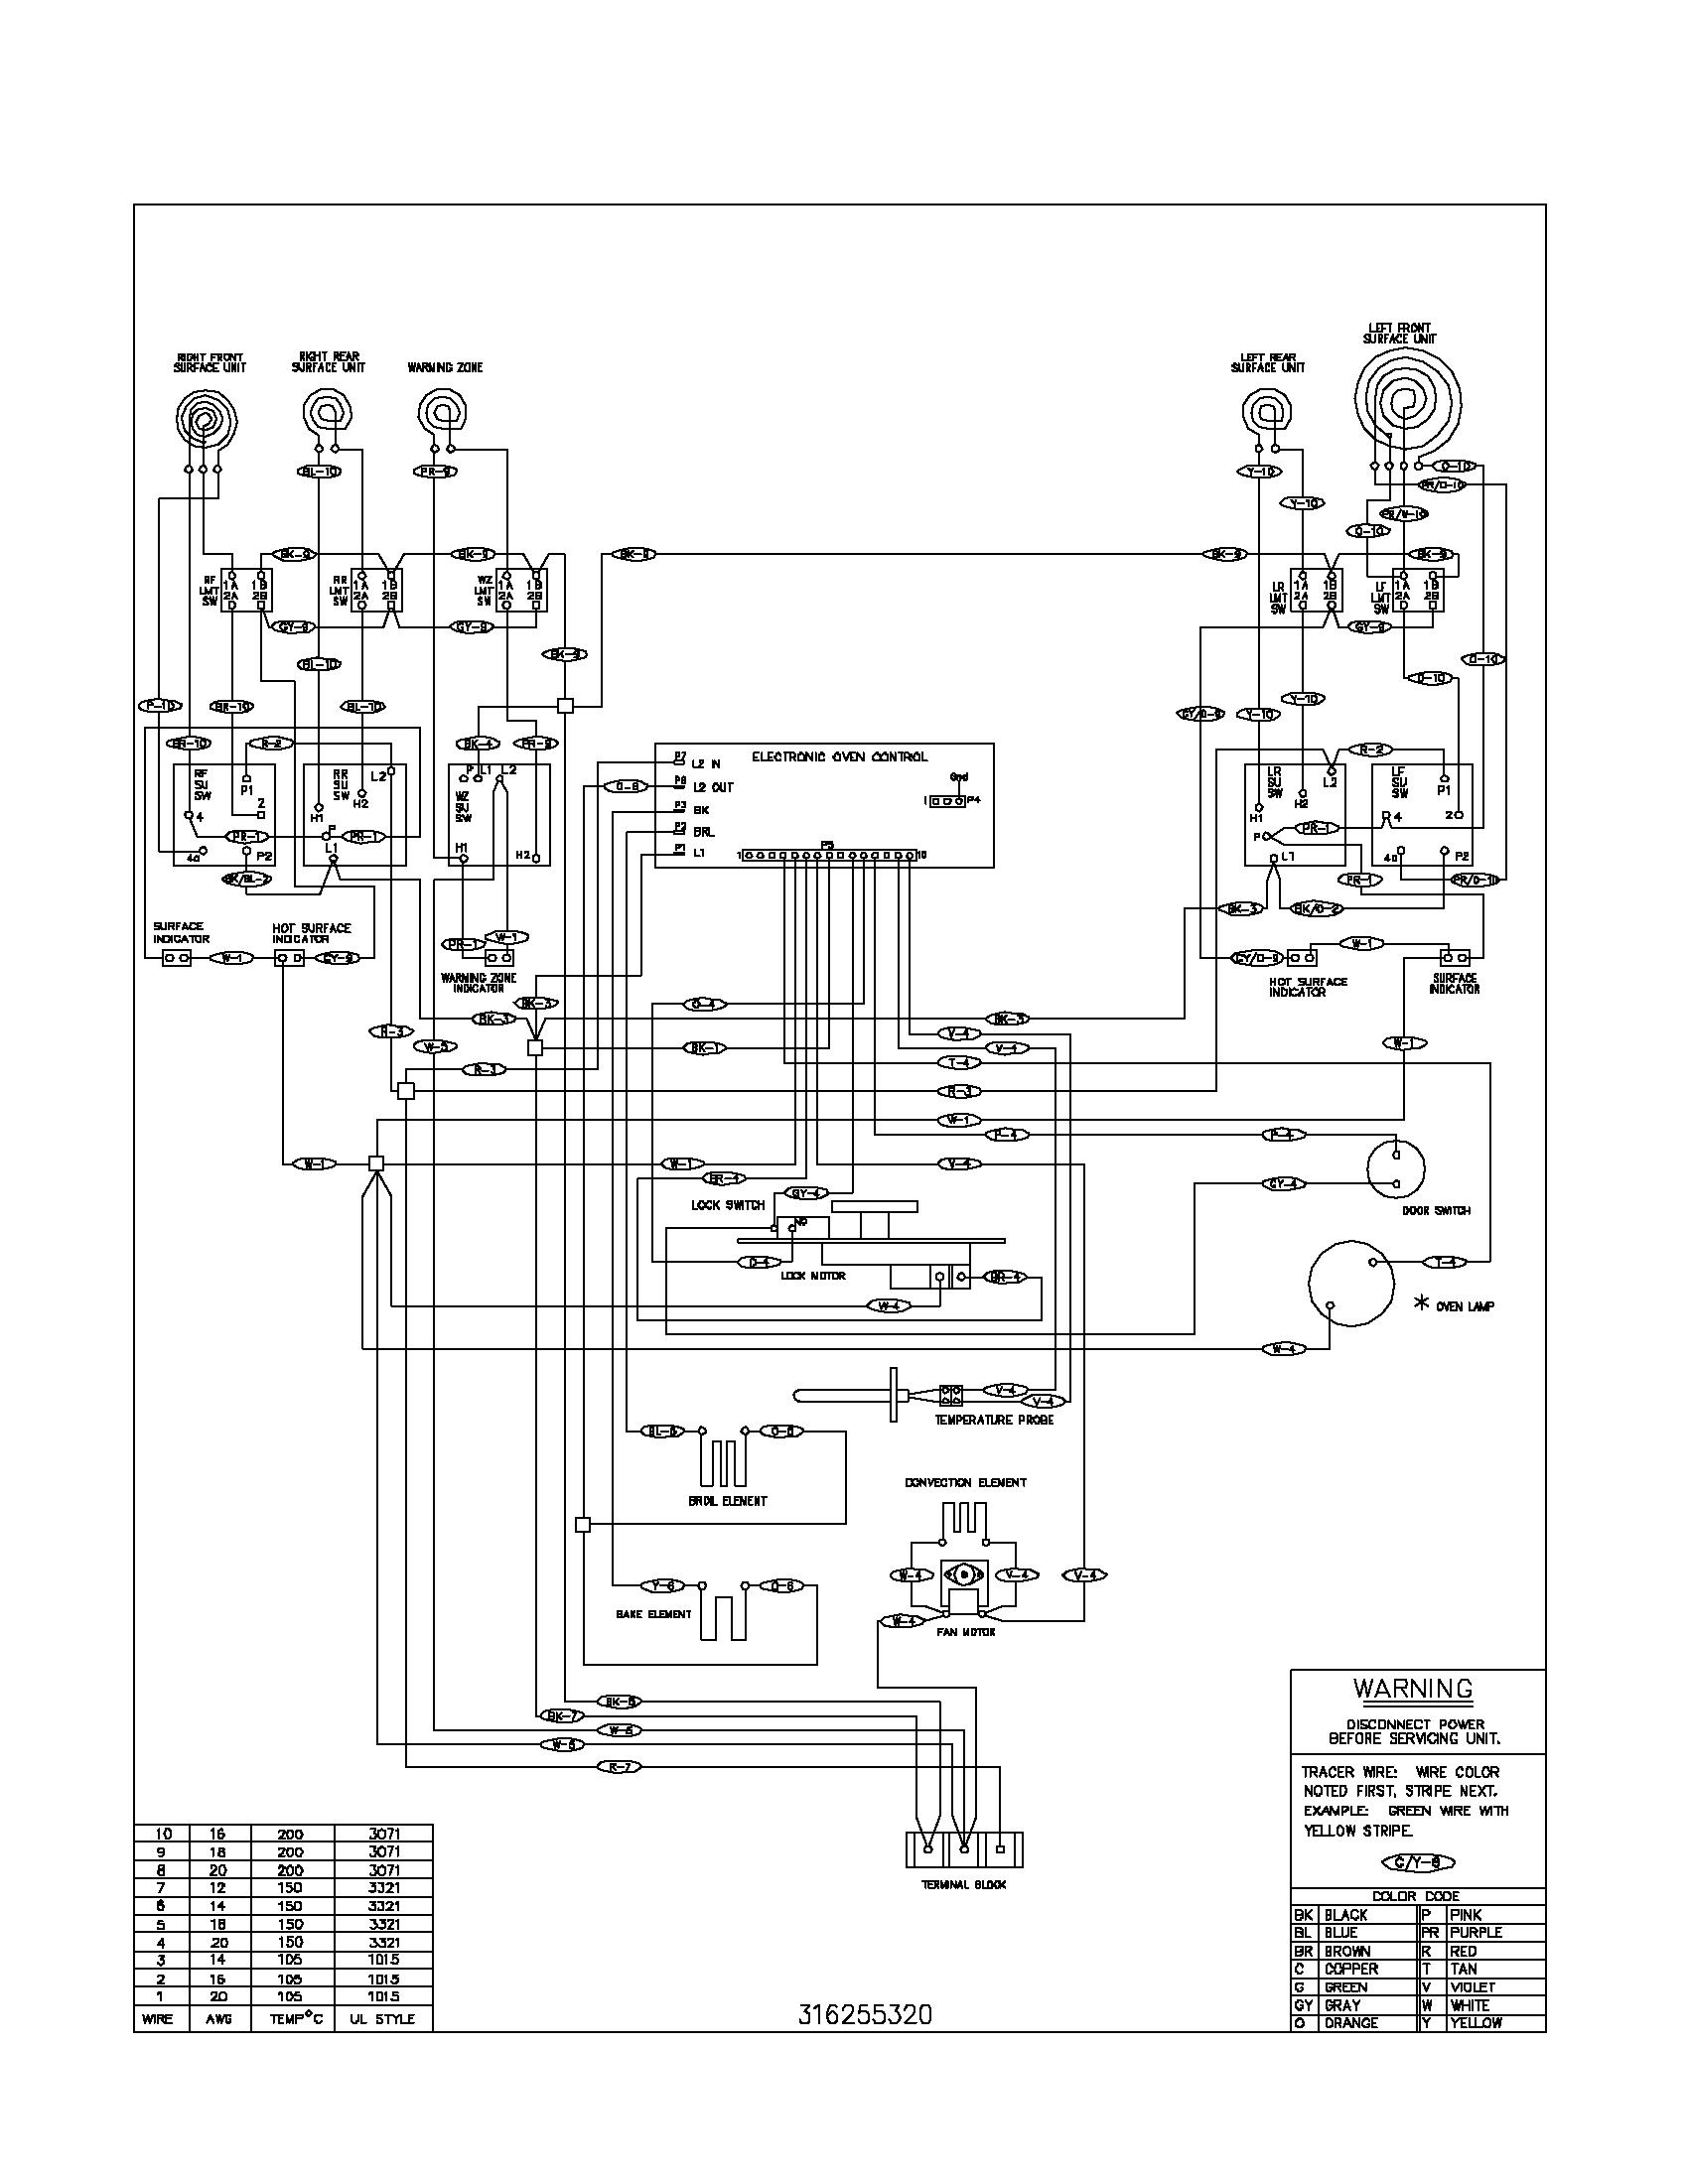 dometic washing machine instructions